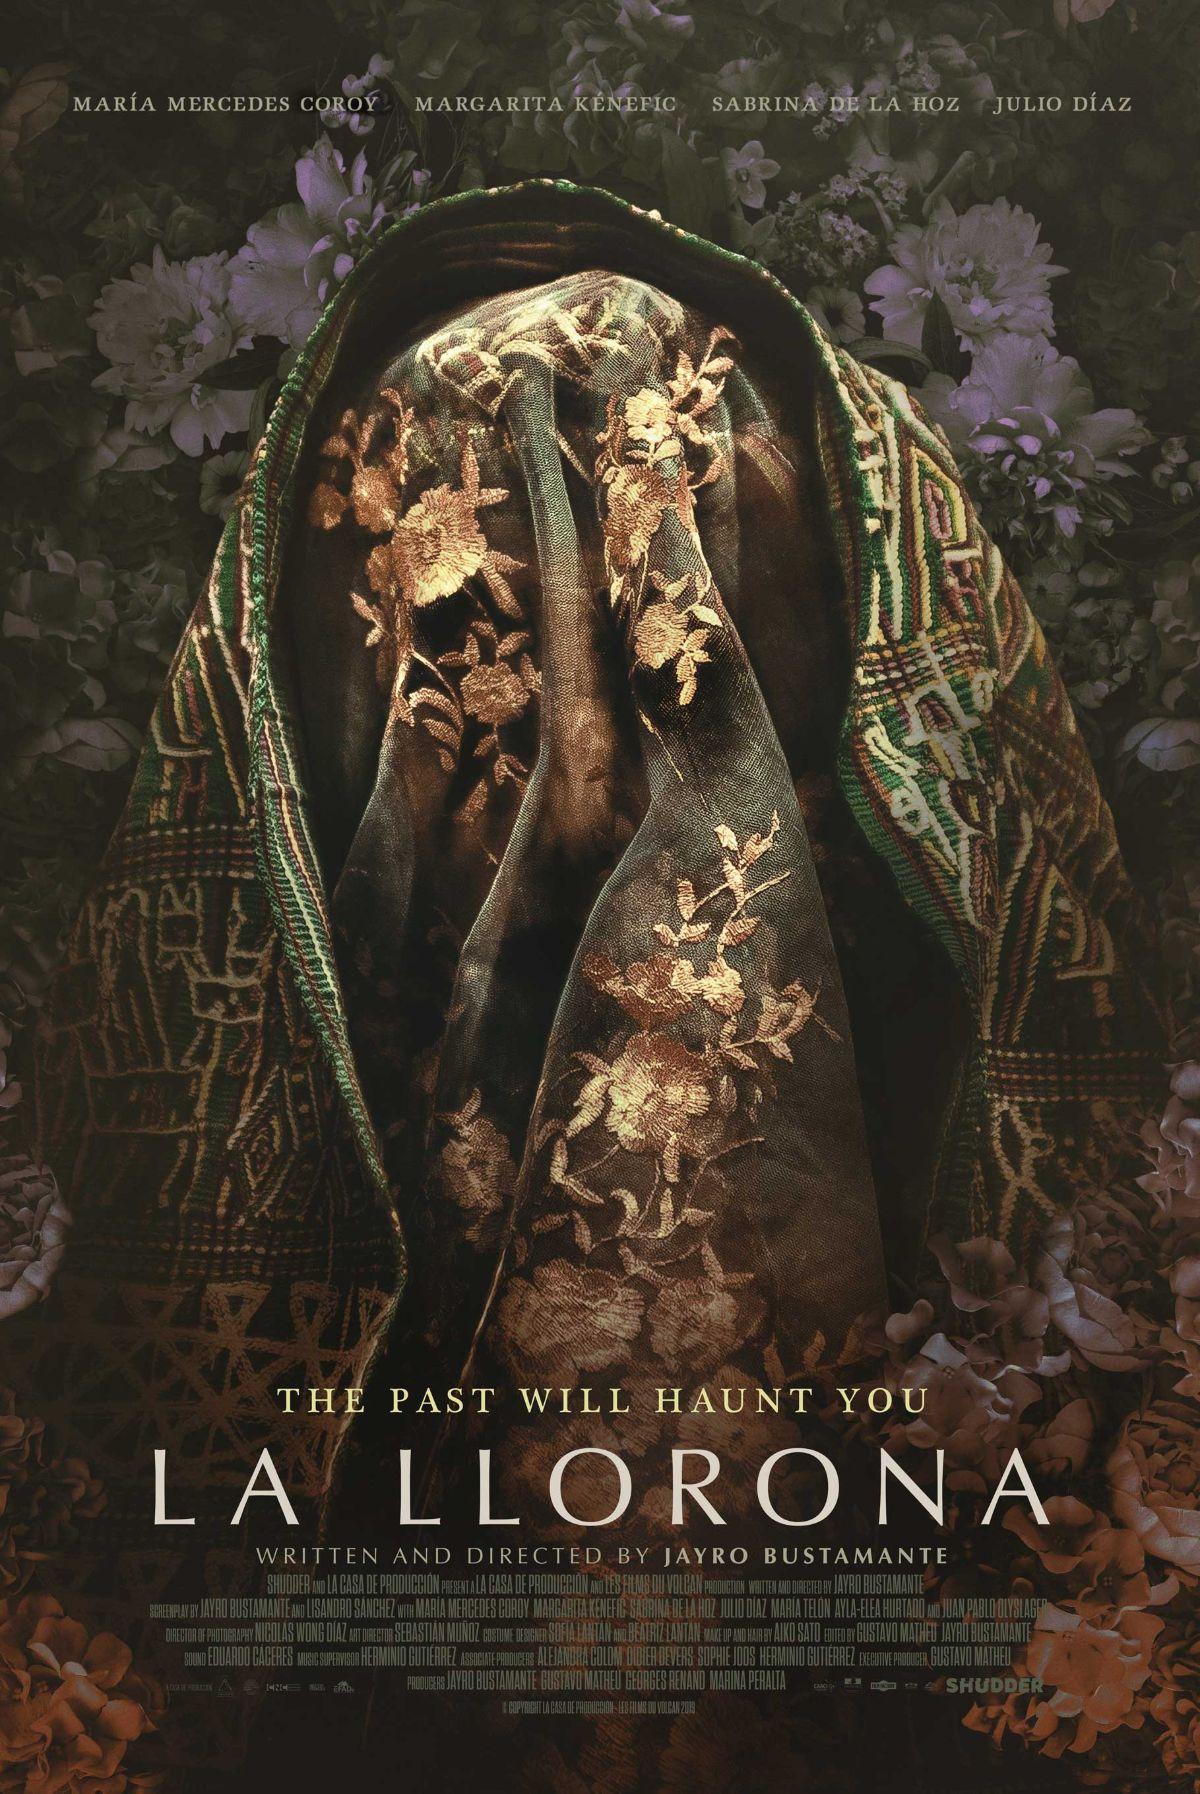 ла йорона 2019 постер